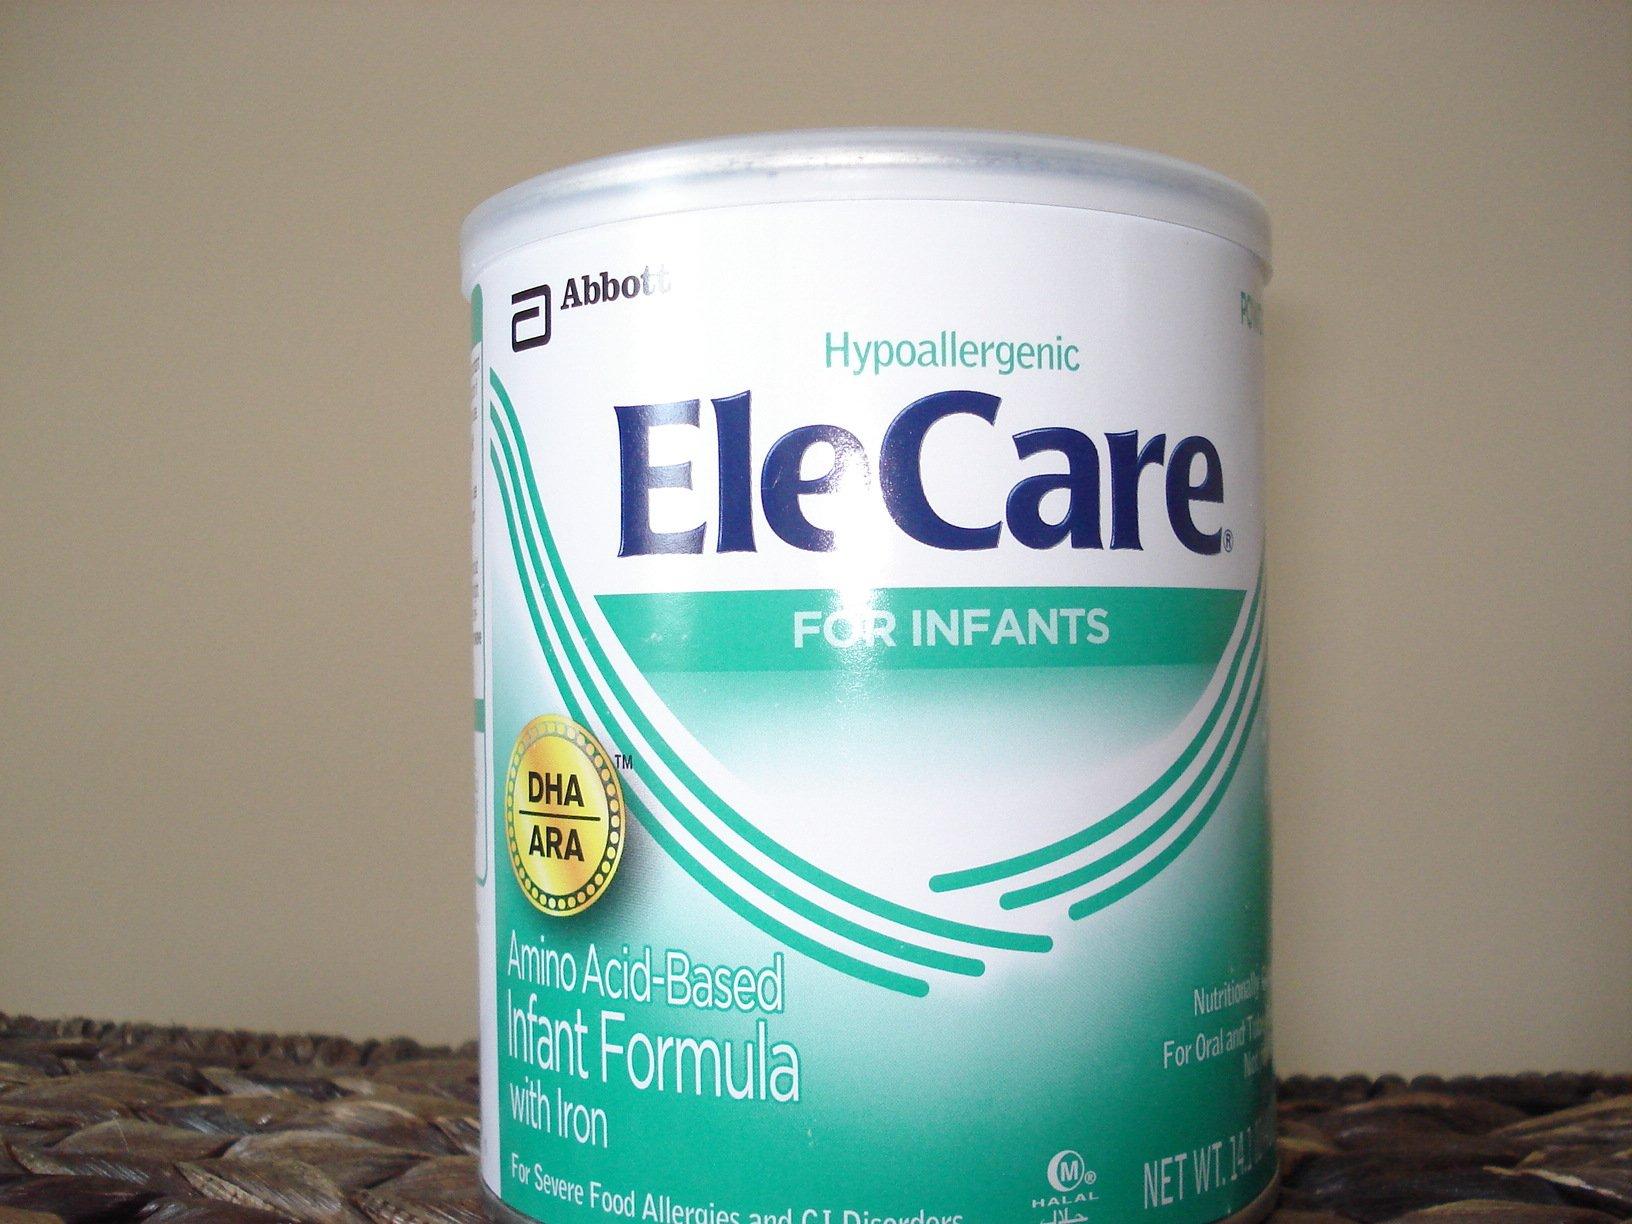 Elecare Infant Formula (DHA/ARA) 14.1 Oz. 5 PACK